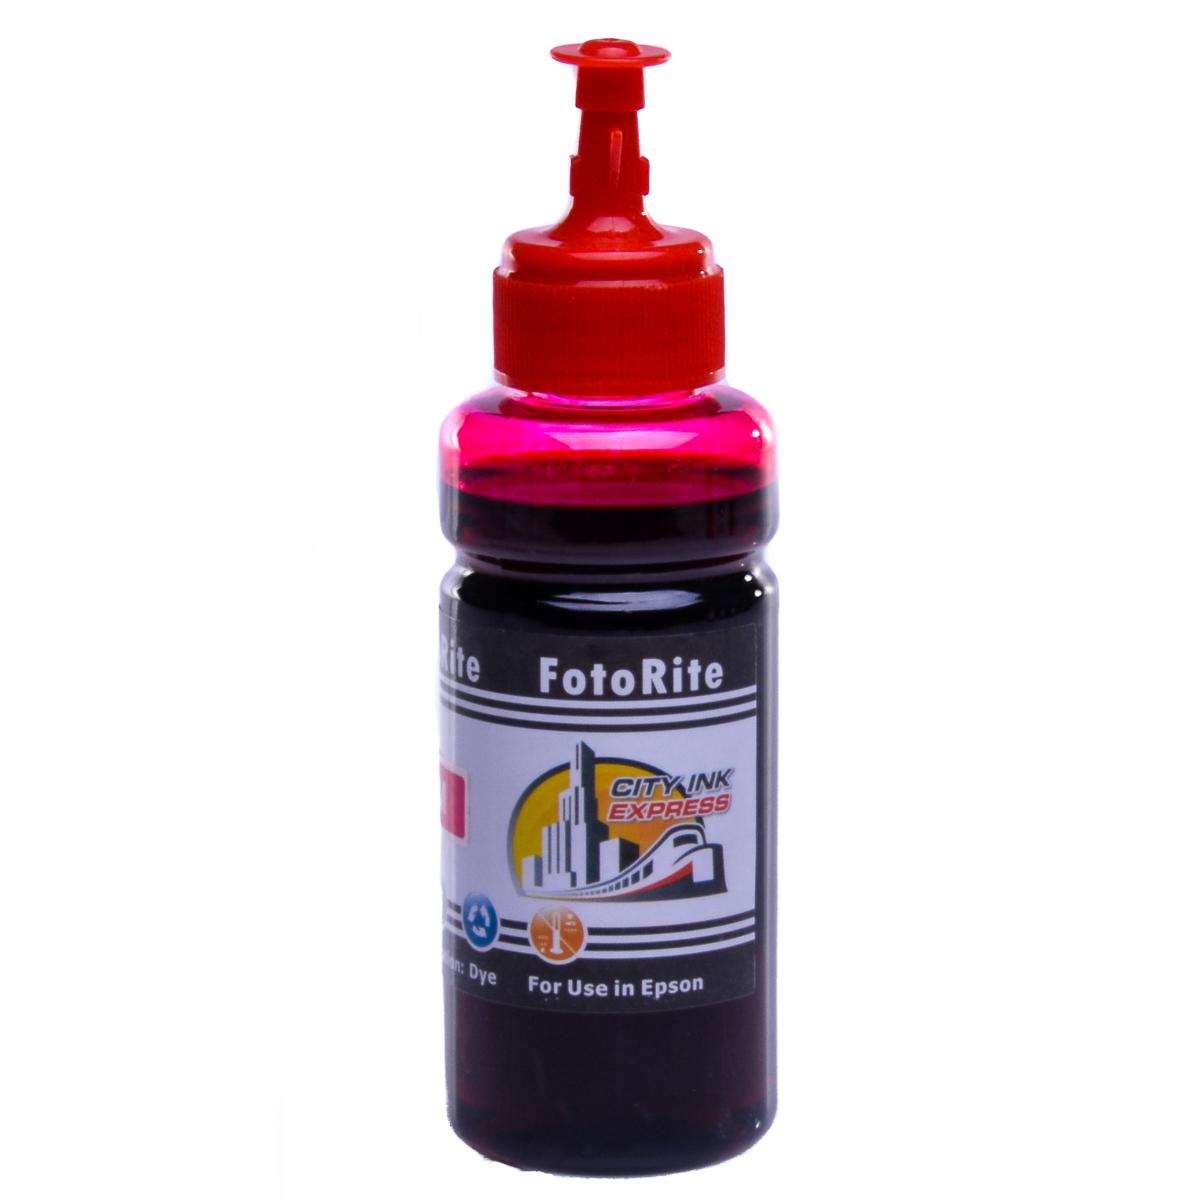 Cheap Magenta dye ink replaces Epson WF-4820DWF - T05H3